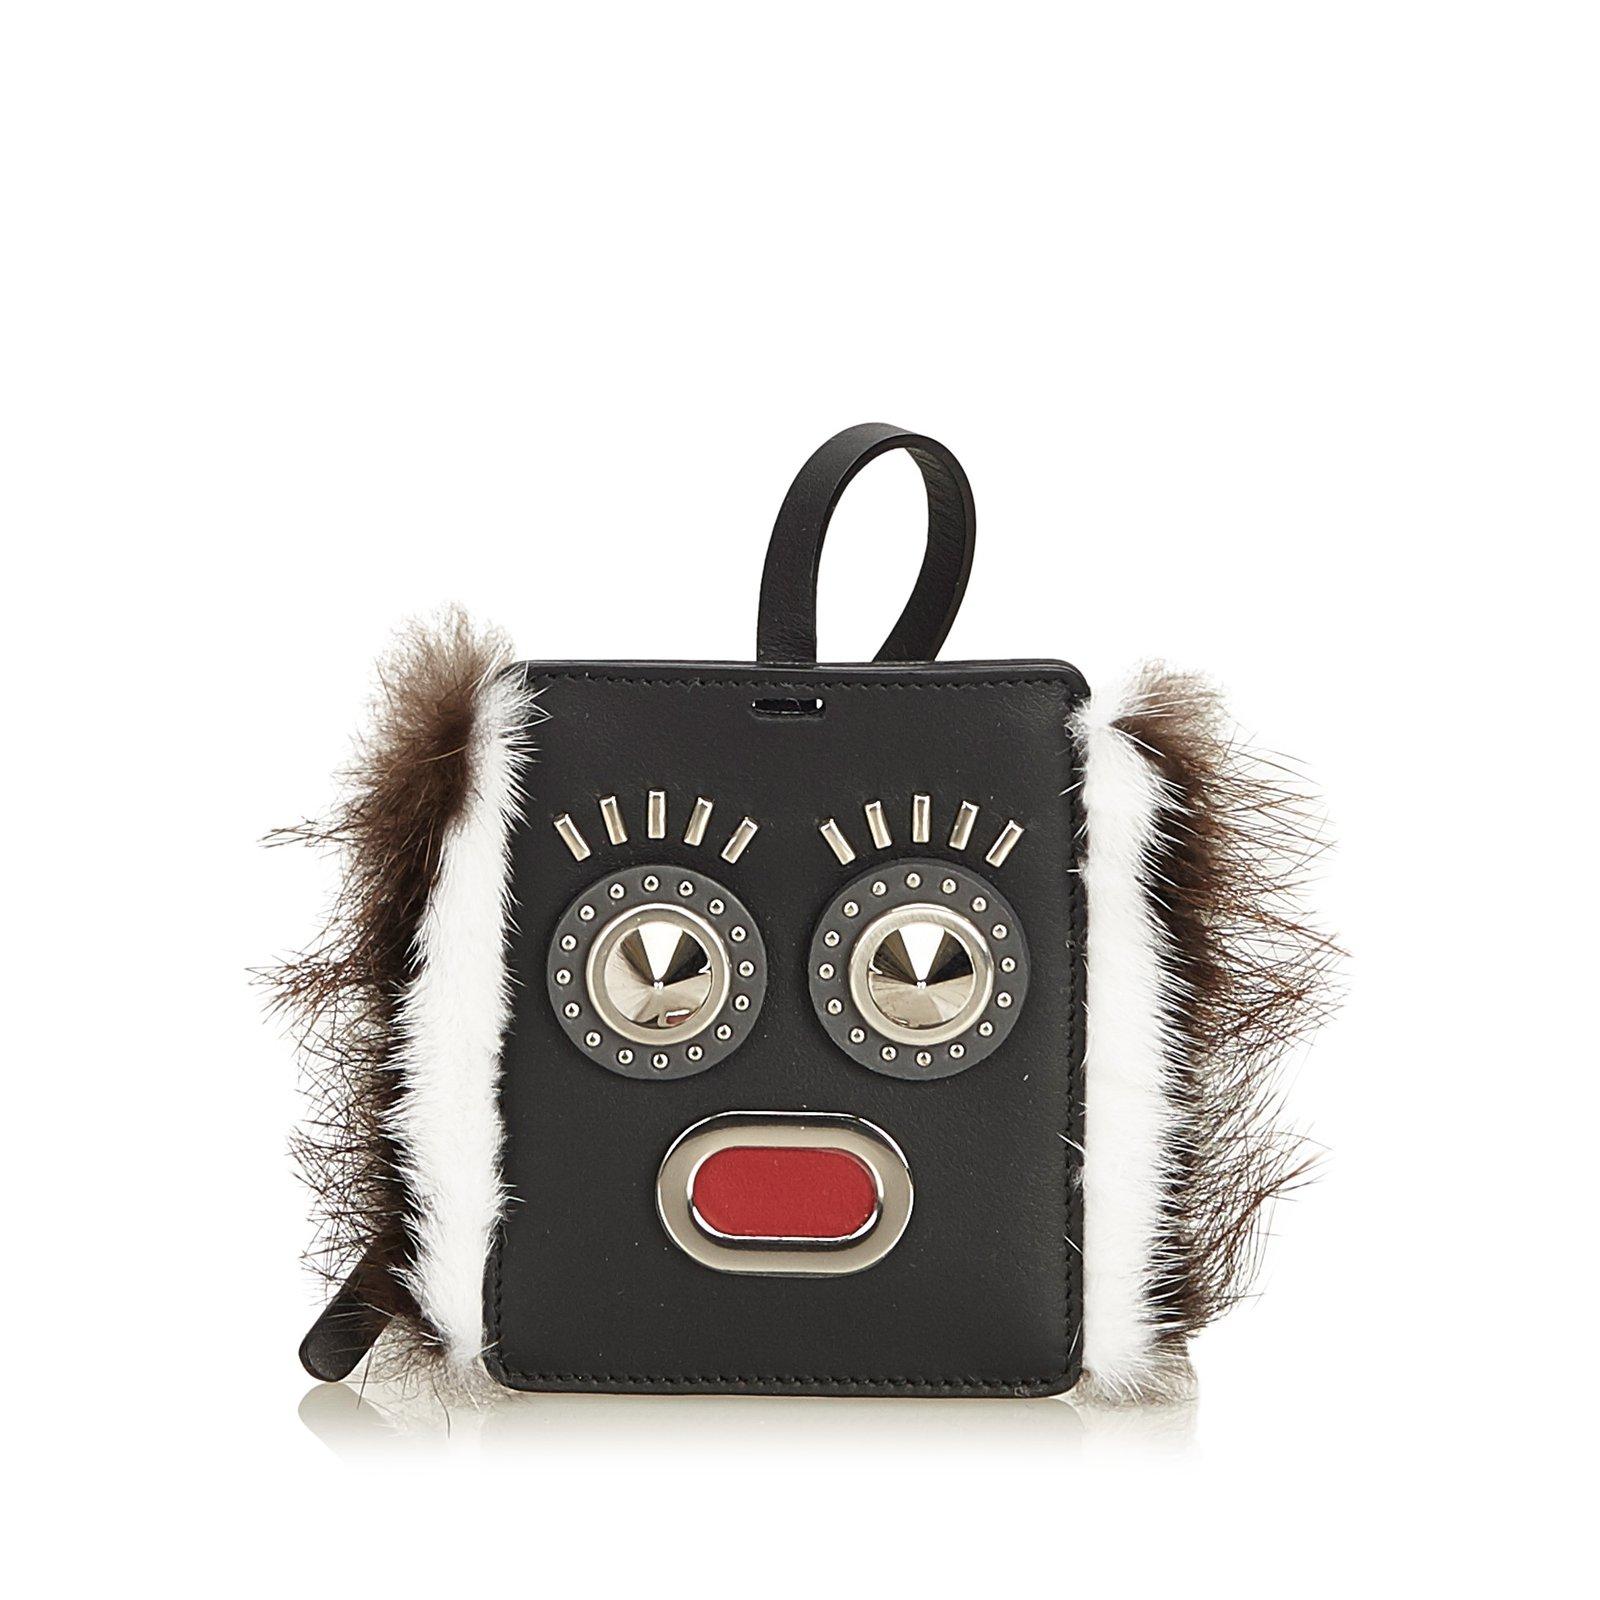 31d6953306 Fendi Fur-Trimmed Monster Face Bag Tag Purses